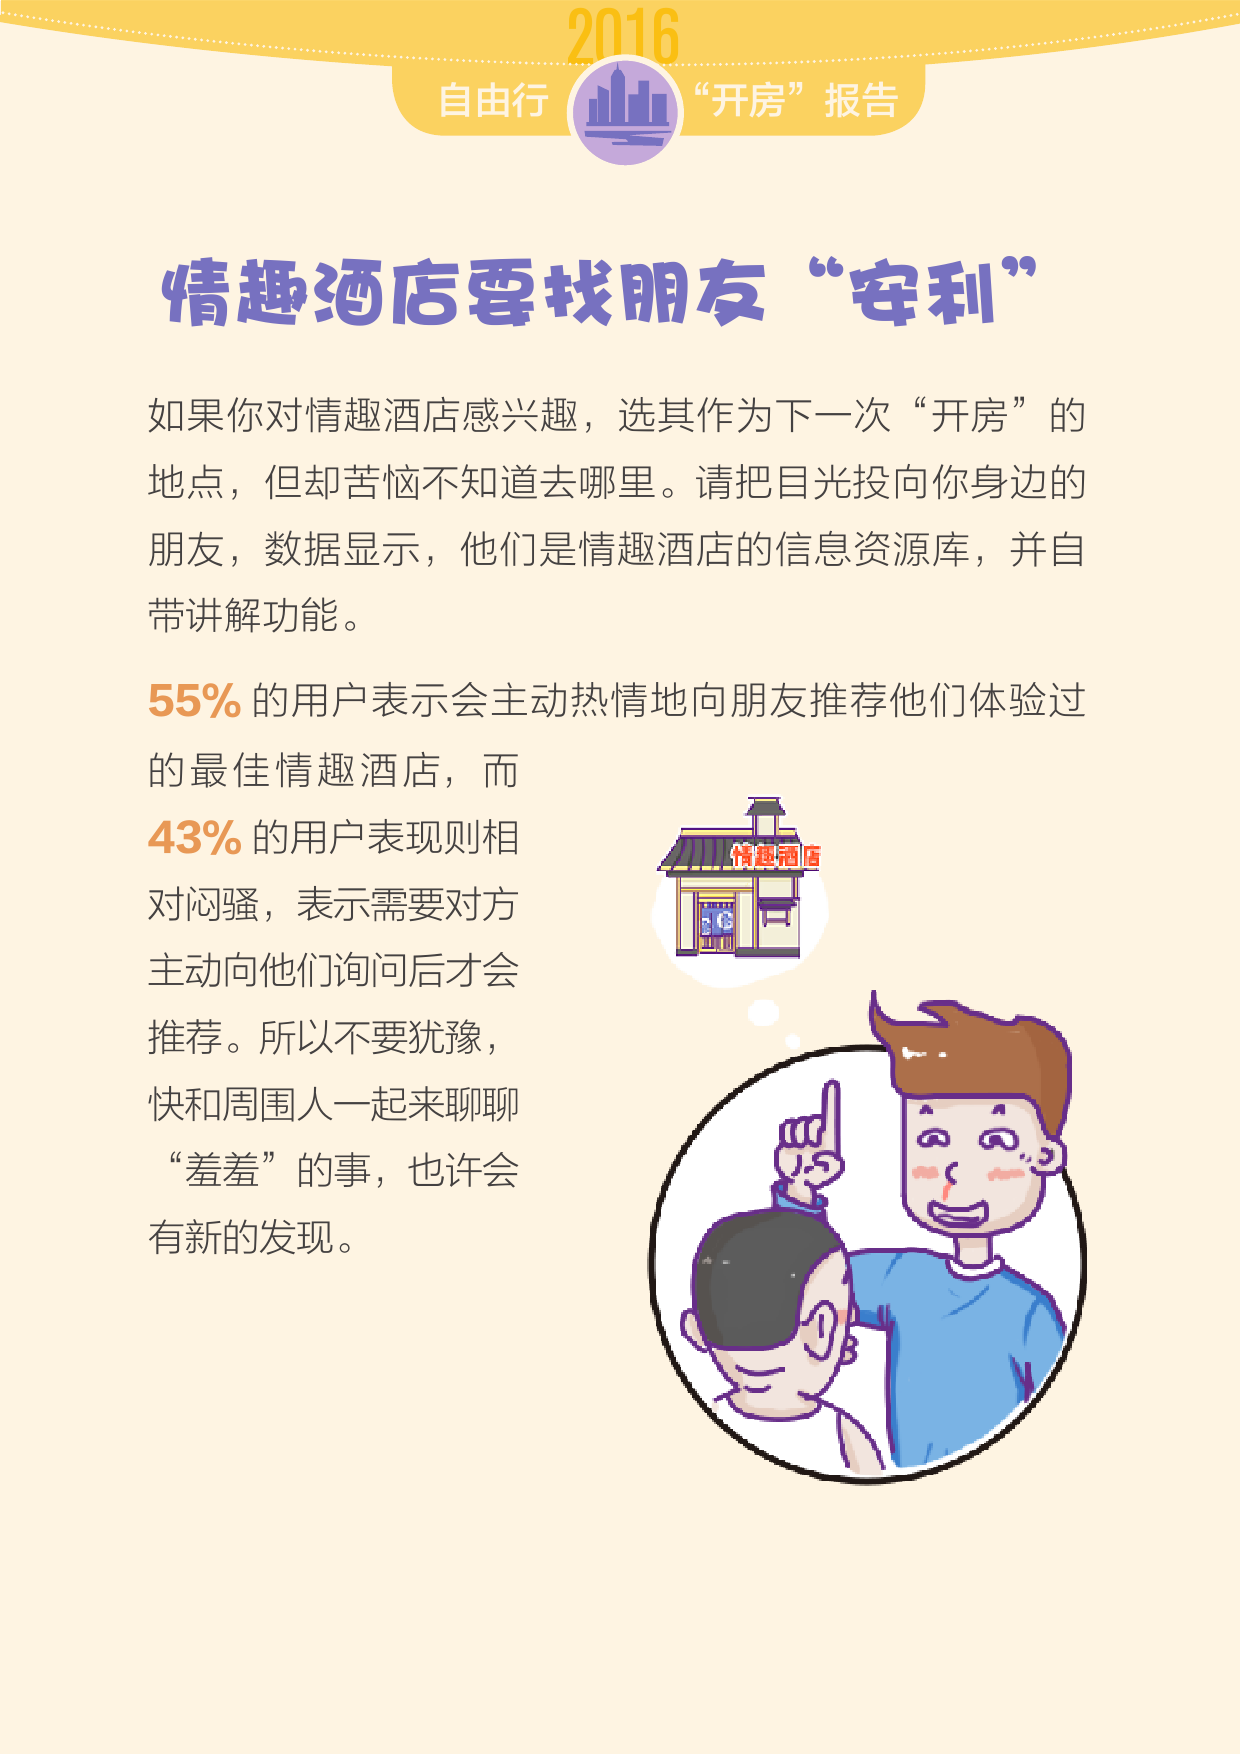 %e8%87%aa%e7%94%b1%e8%a1%8c%e5%bc%80%e6%88%bf%e6%8a%a5%e5%91%8a2016_000027